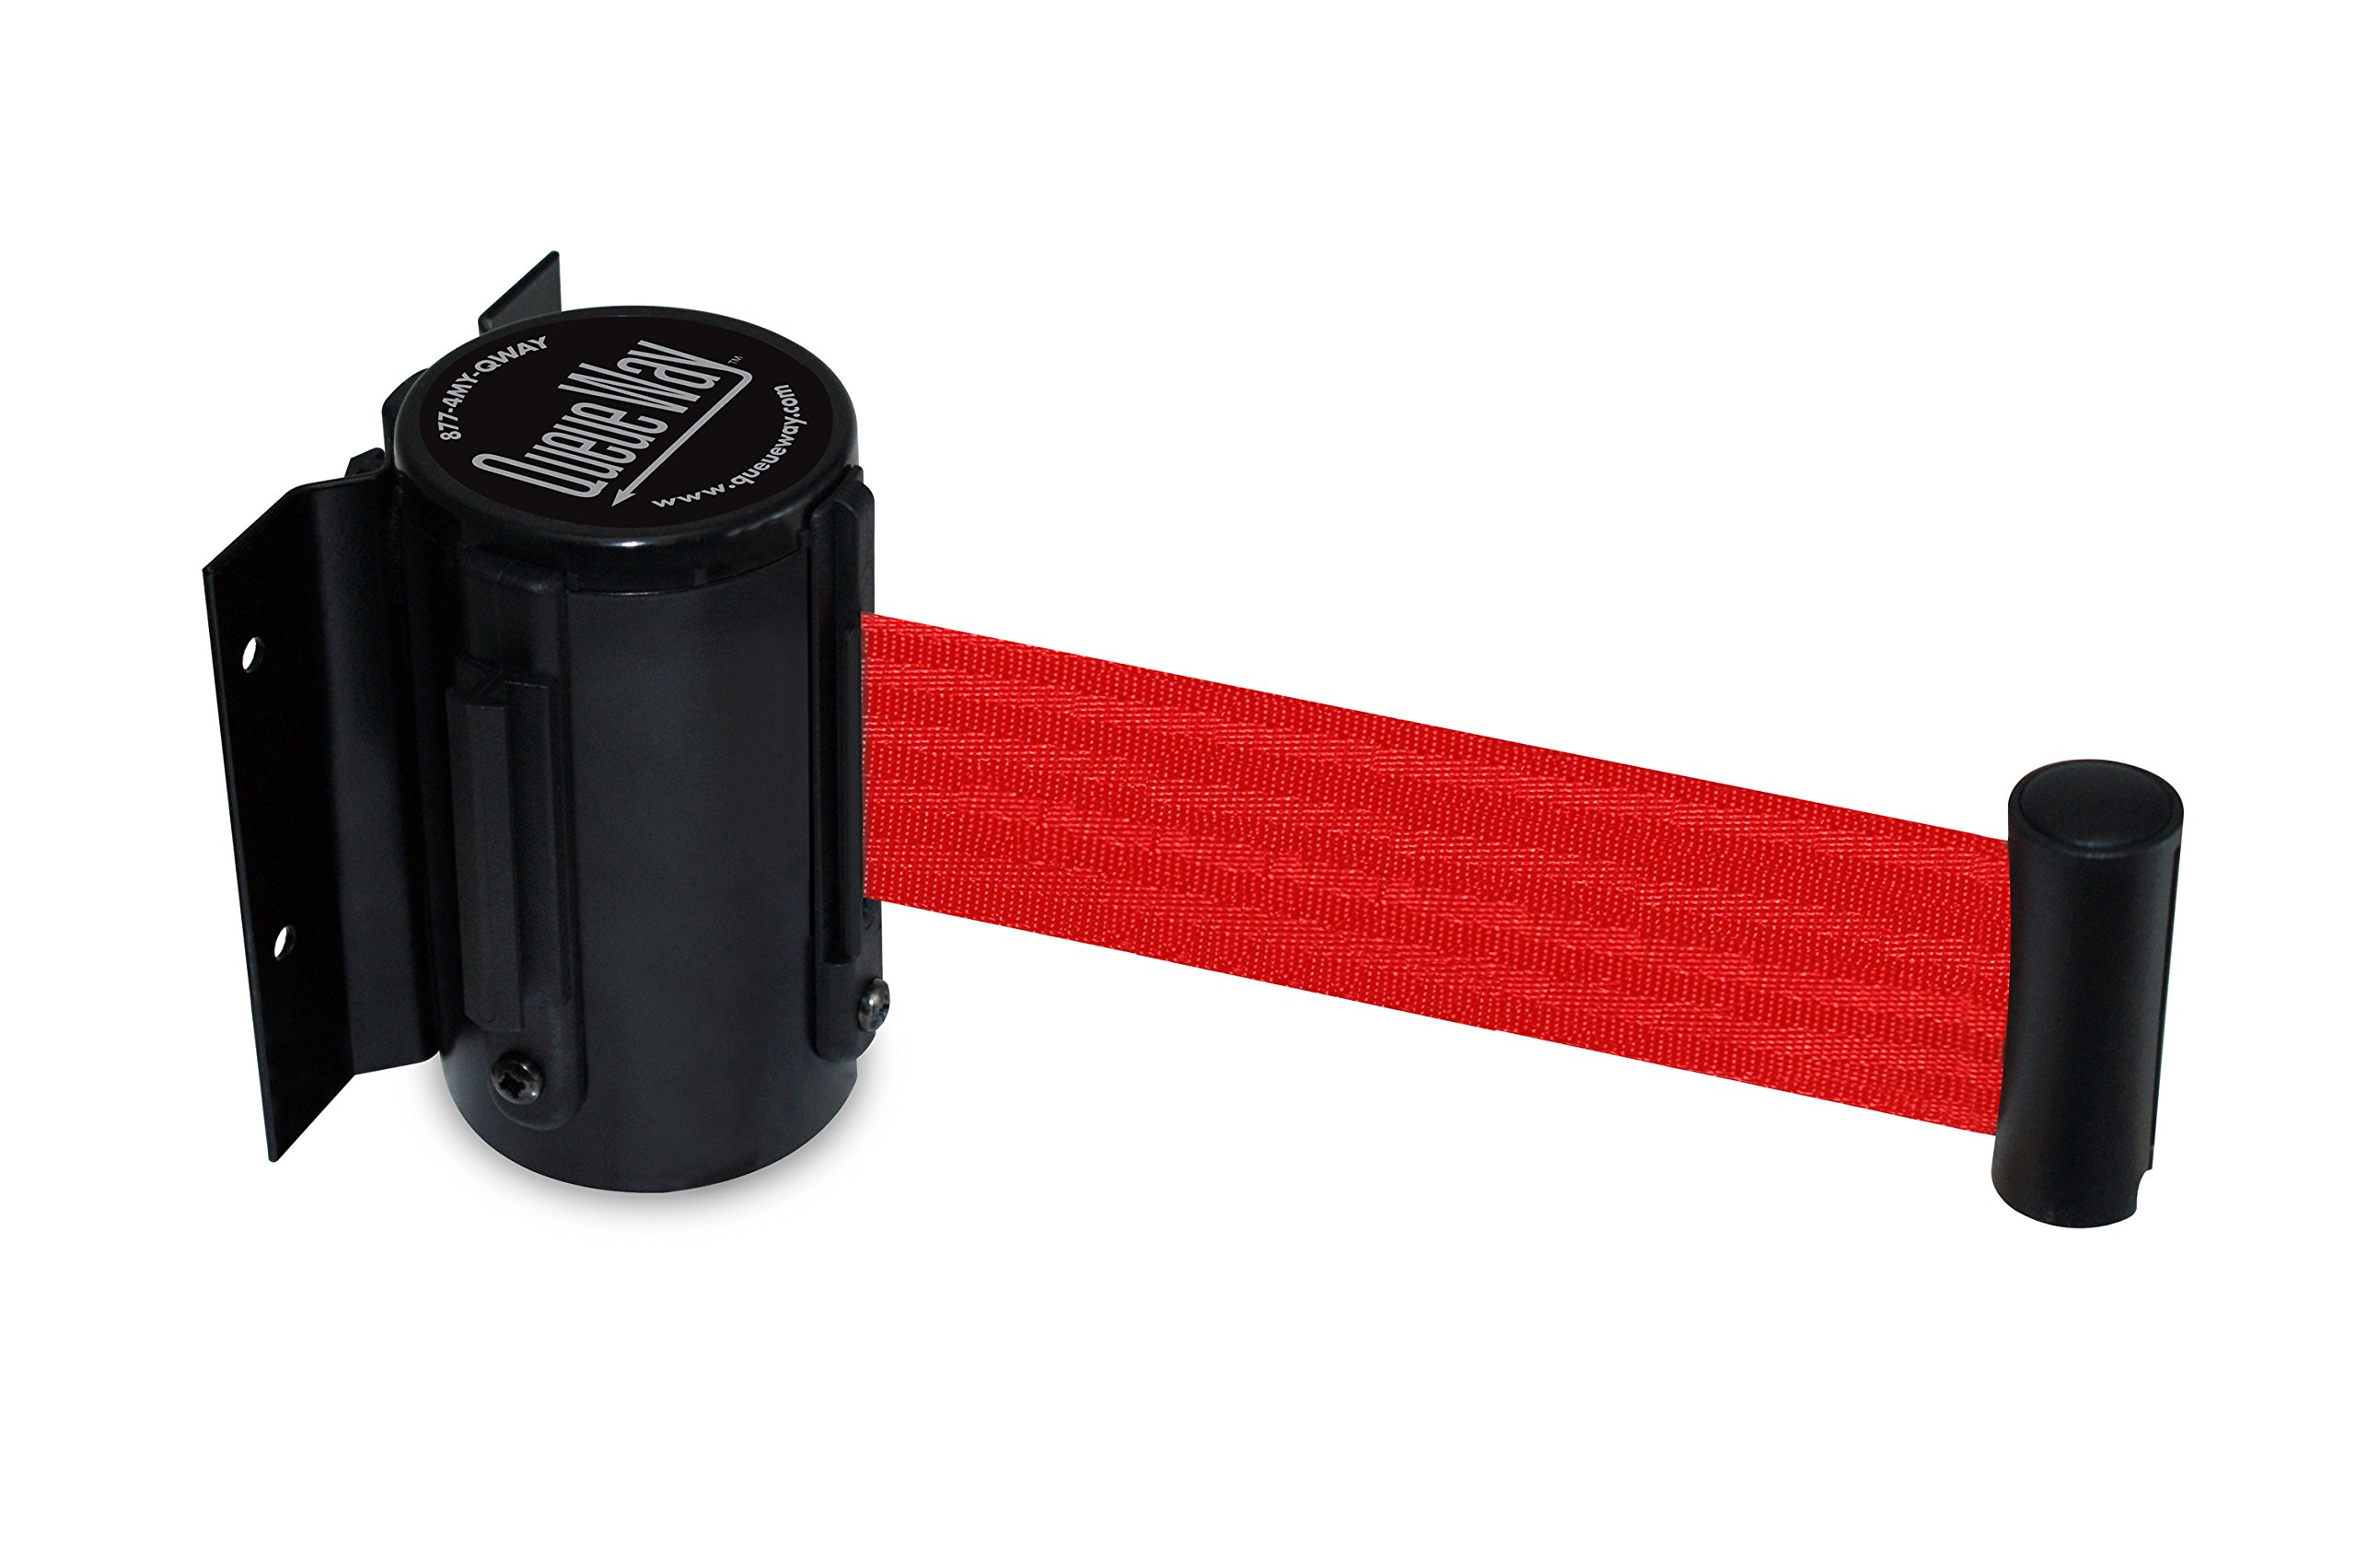 Tensator QWAYWALL-R5 QwayWall - Wall Mounted, Black Finish, Red 7'6'' Belt by Tensator